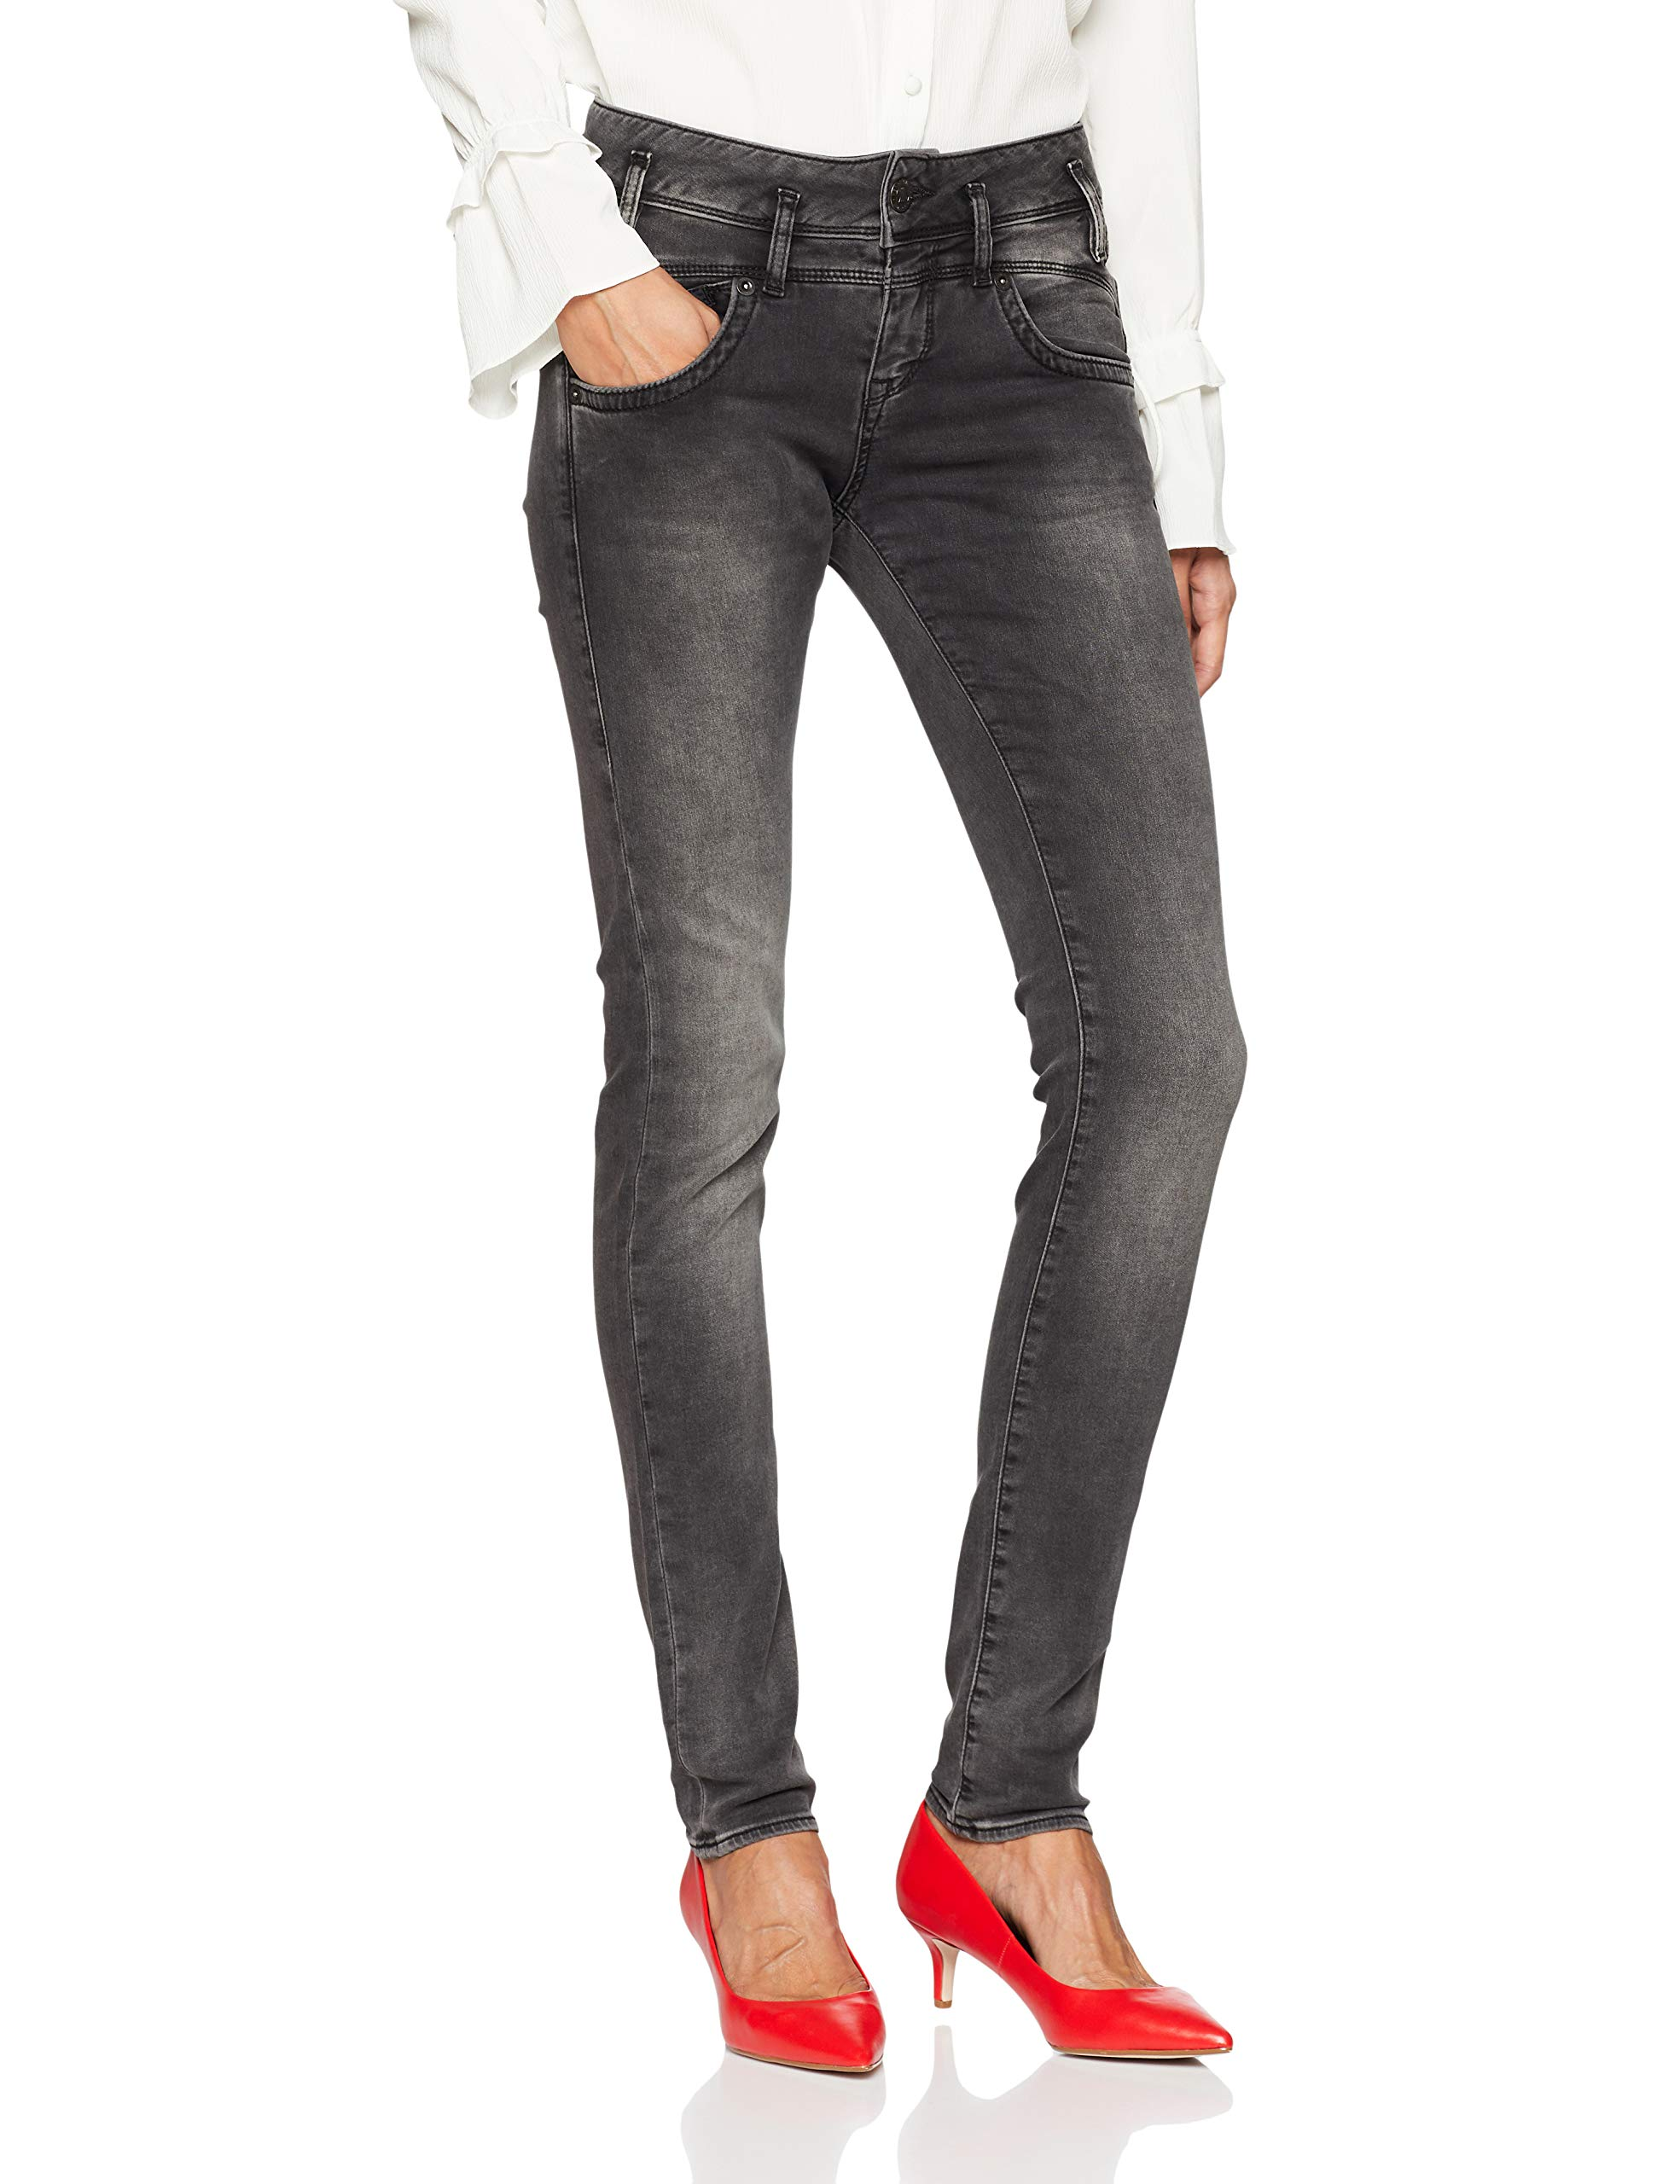 Femme Slim JeanSchwarzcharcoal 770W28 Herrlicher Pearl l33 OPwnk0